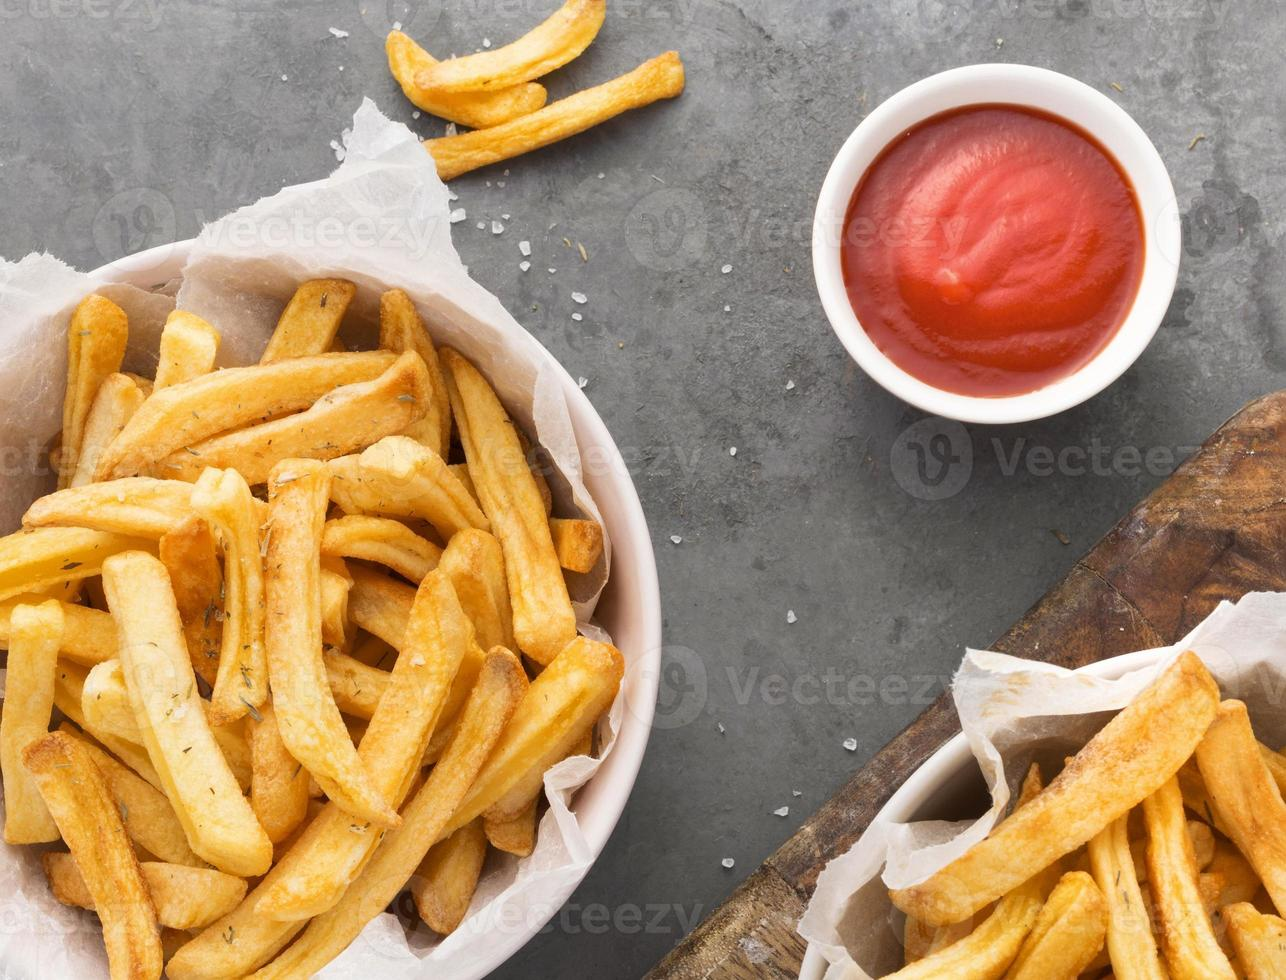 Vista superior del tazón de papas fritas con salsa de tomate foto